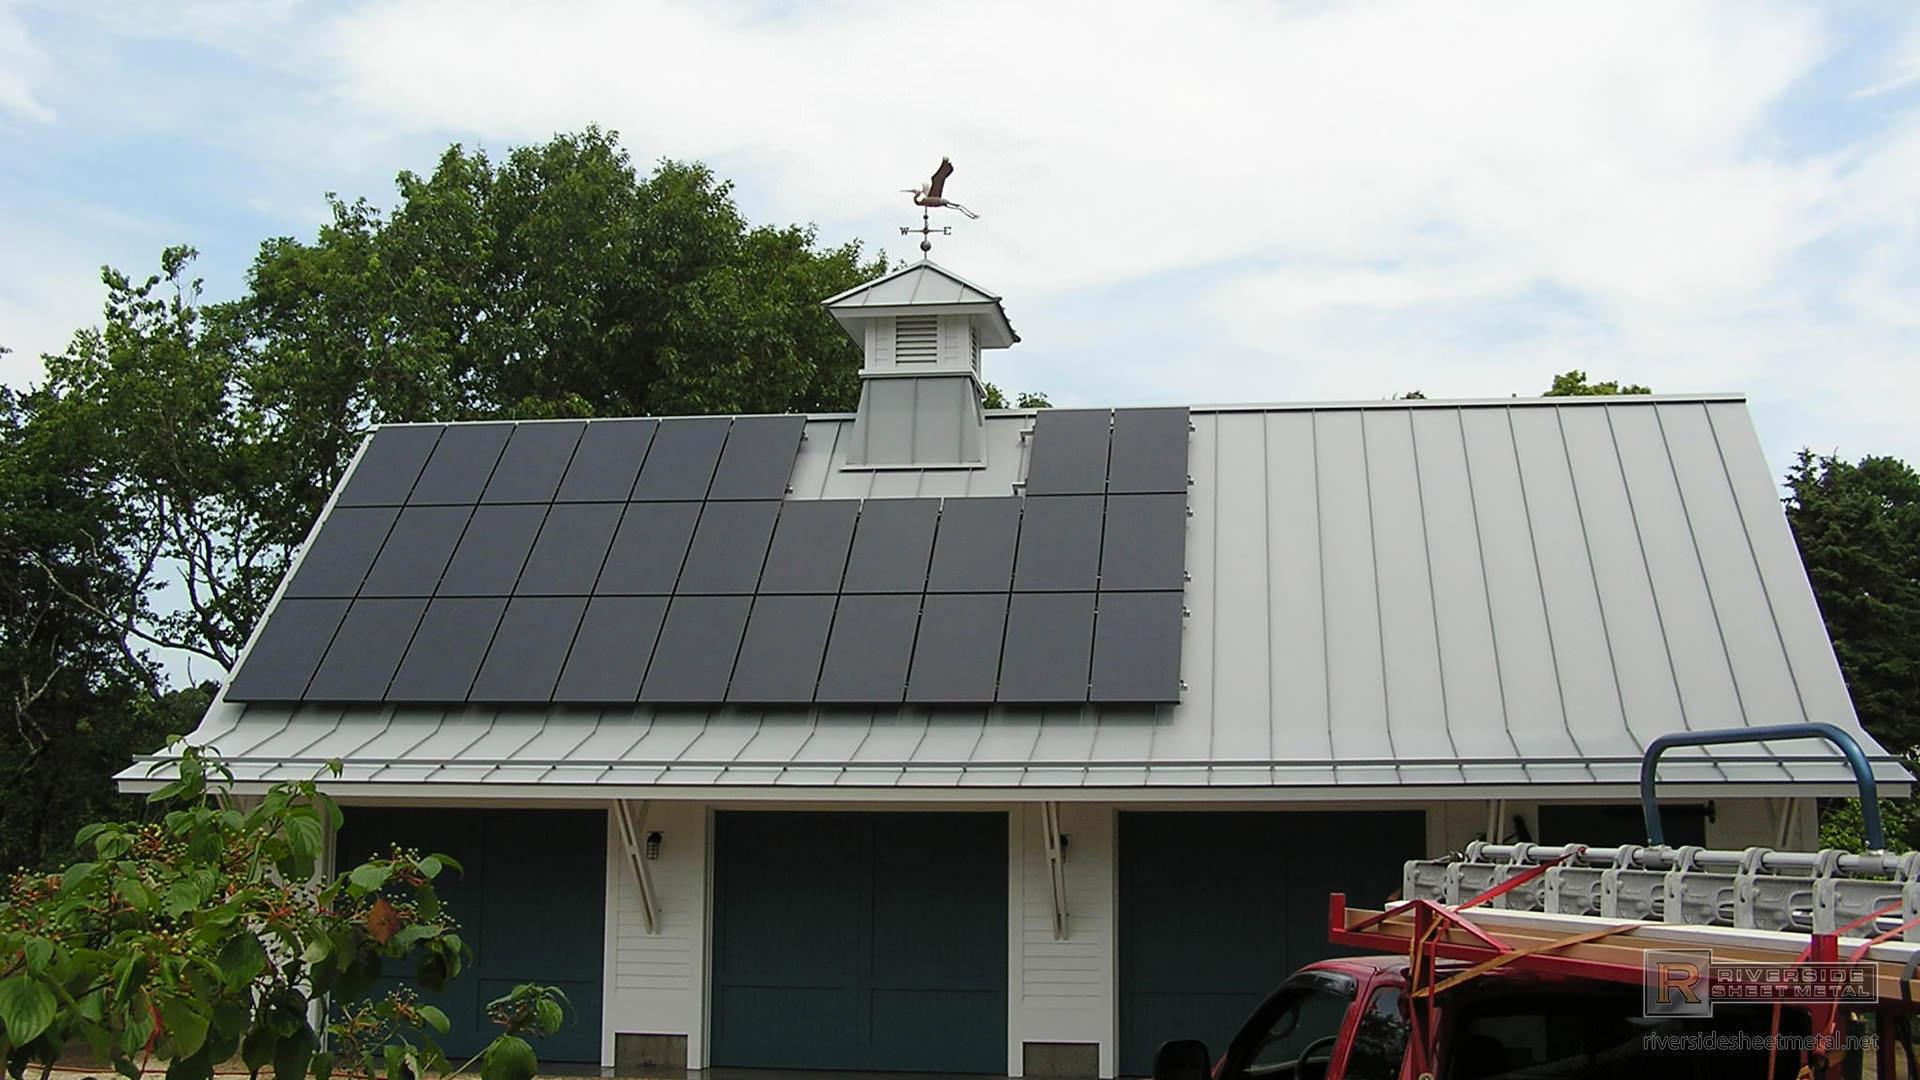 Dove Gray Standing Seam Metal Roofing Panels Riverside